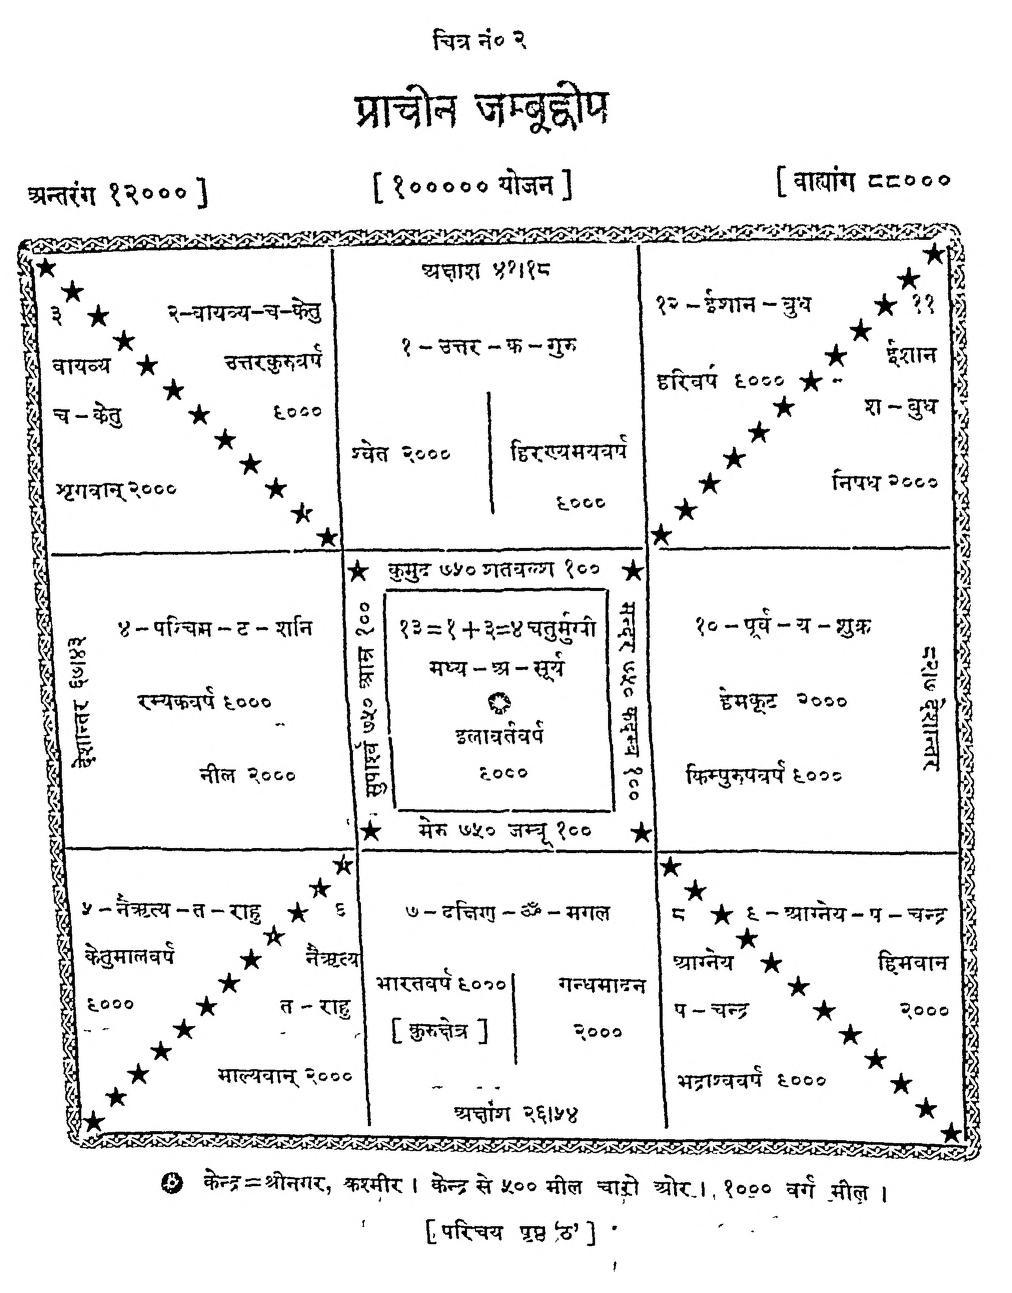 Book Image : प्राचीन जम्बुद्वीप  - Pracheen Jambudweep